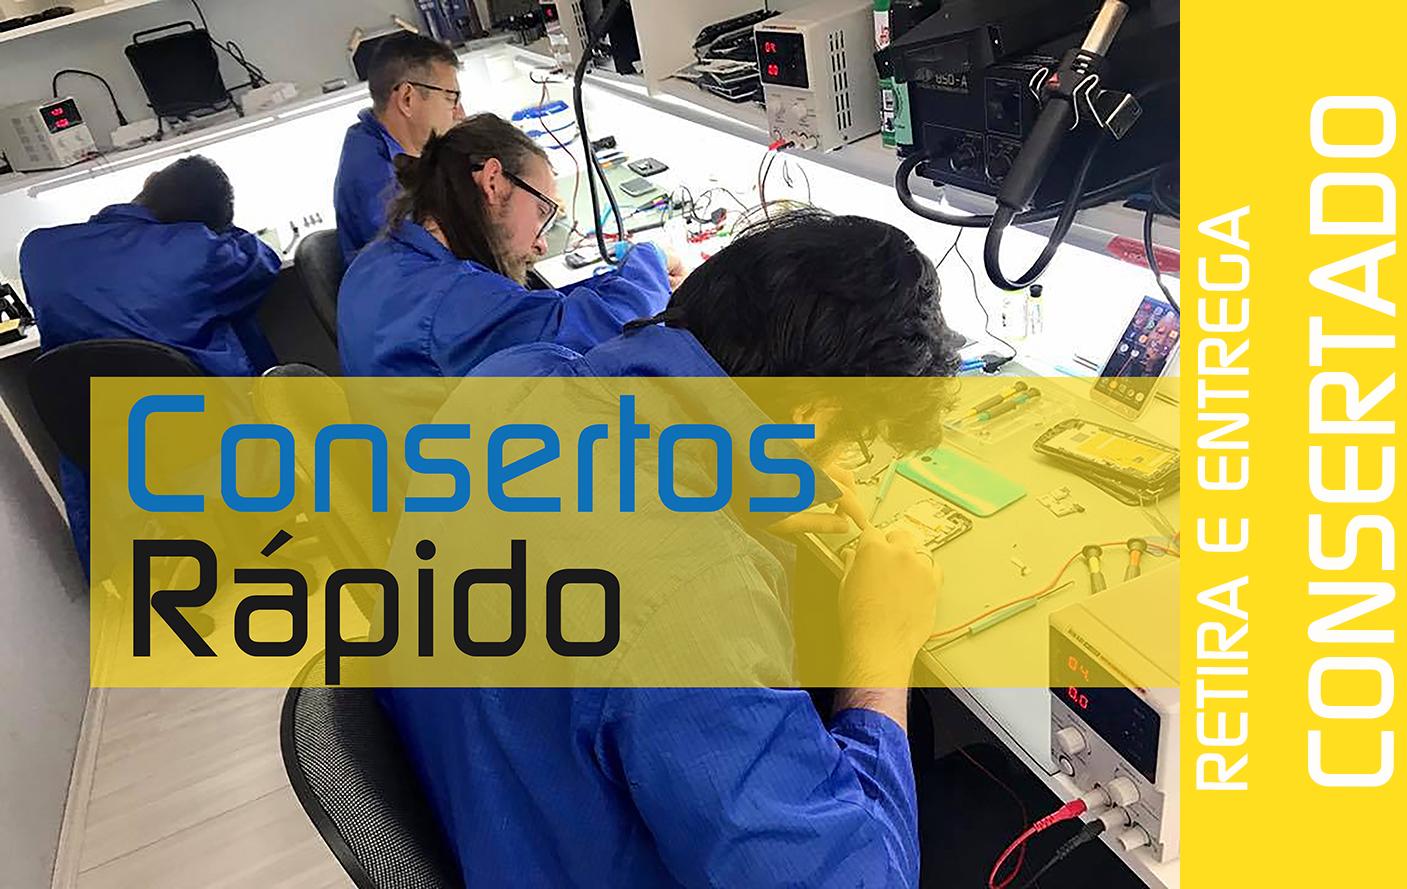 Consertos Rapido - Consertar Celular em Domicílio -